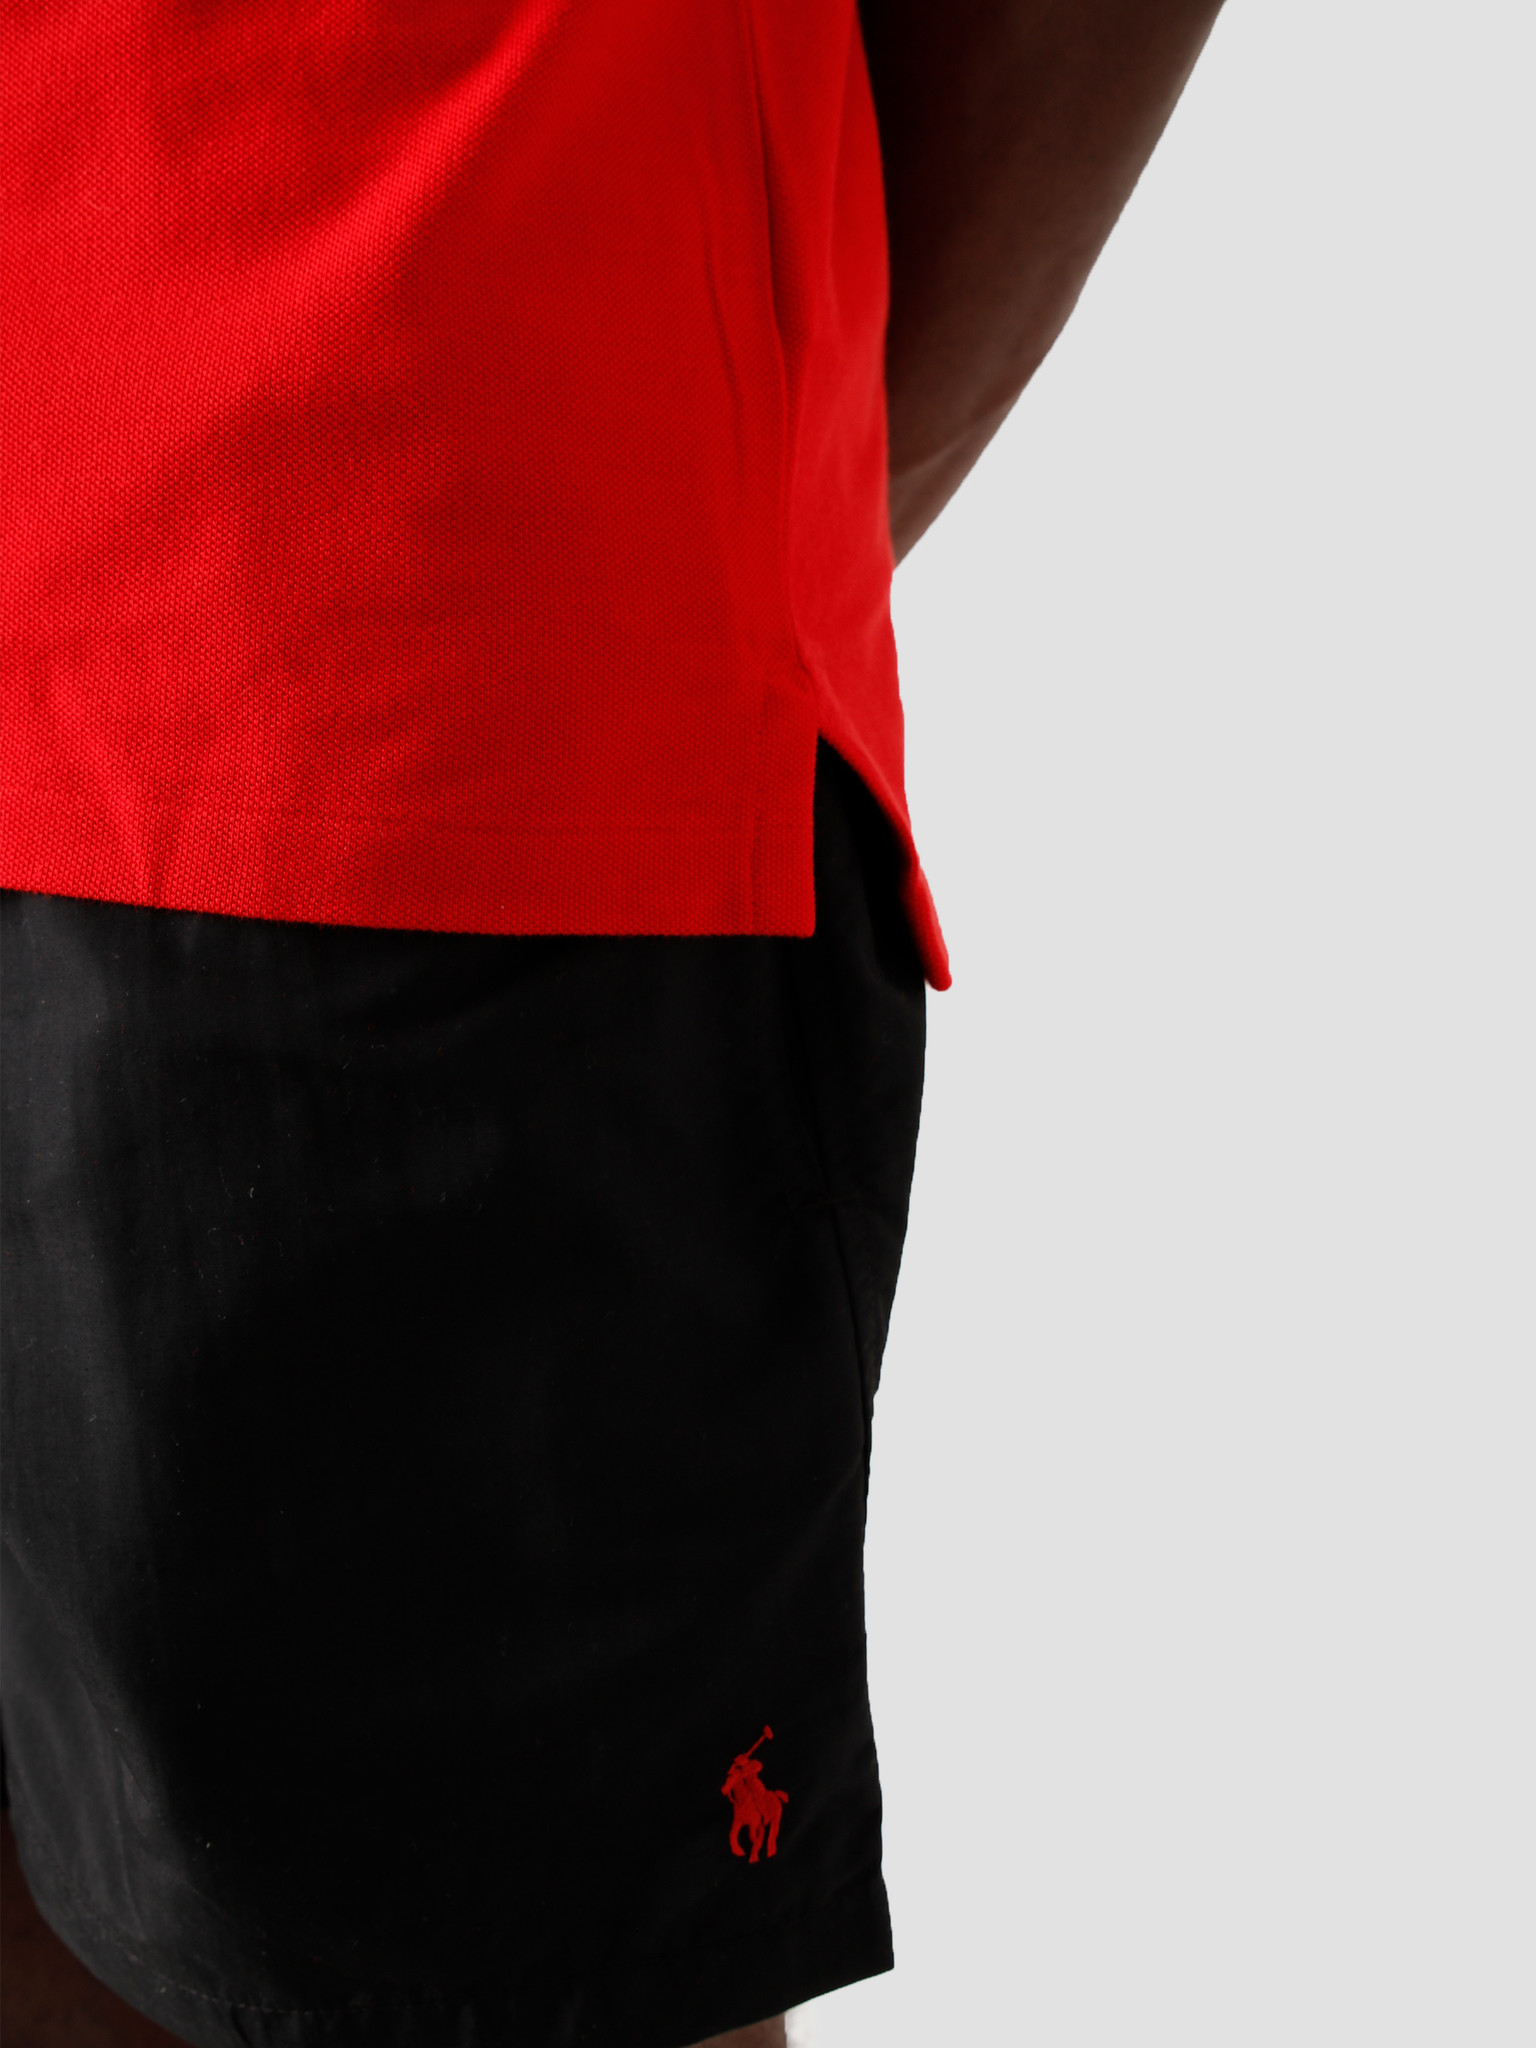 Polo Ralph Lauren Polo Ralph Lauren Classic Polo RL2000 Red 710666998003